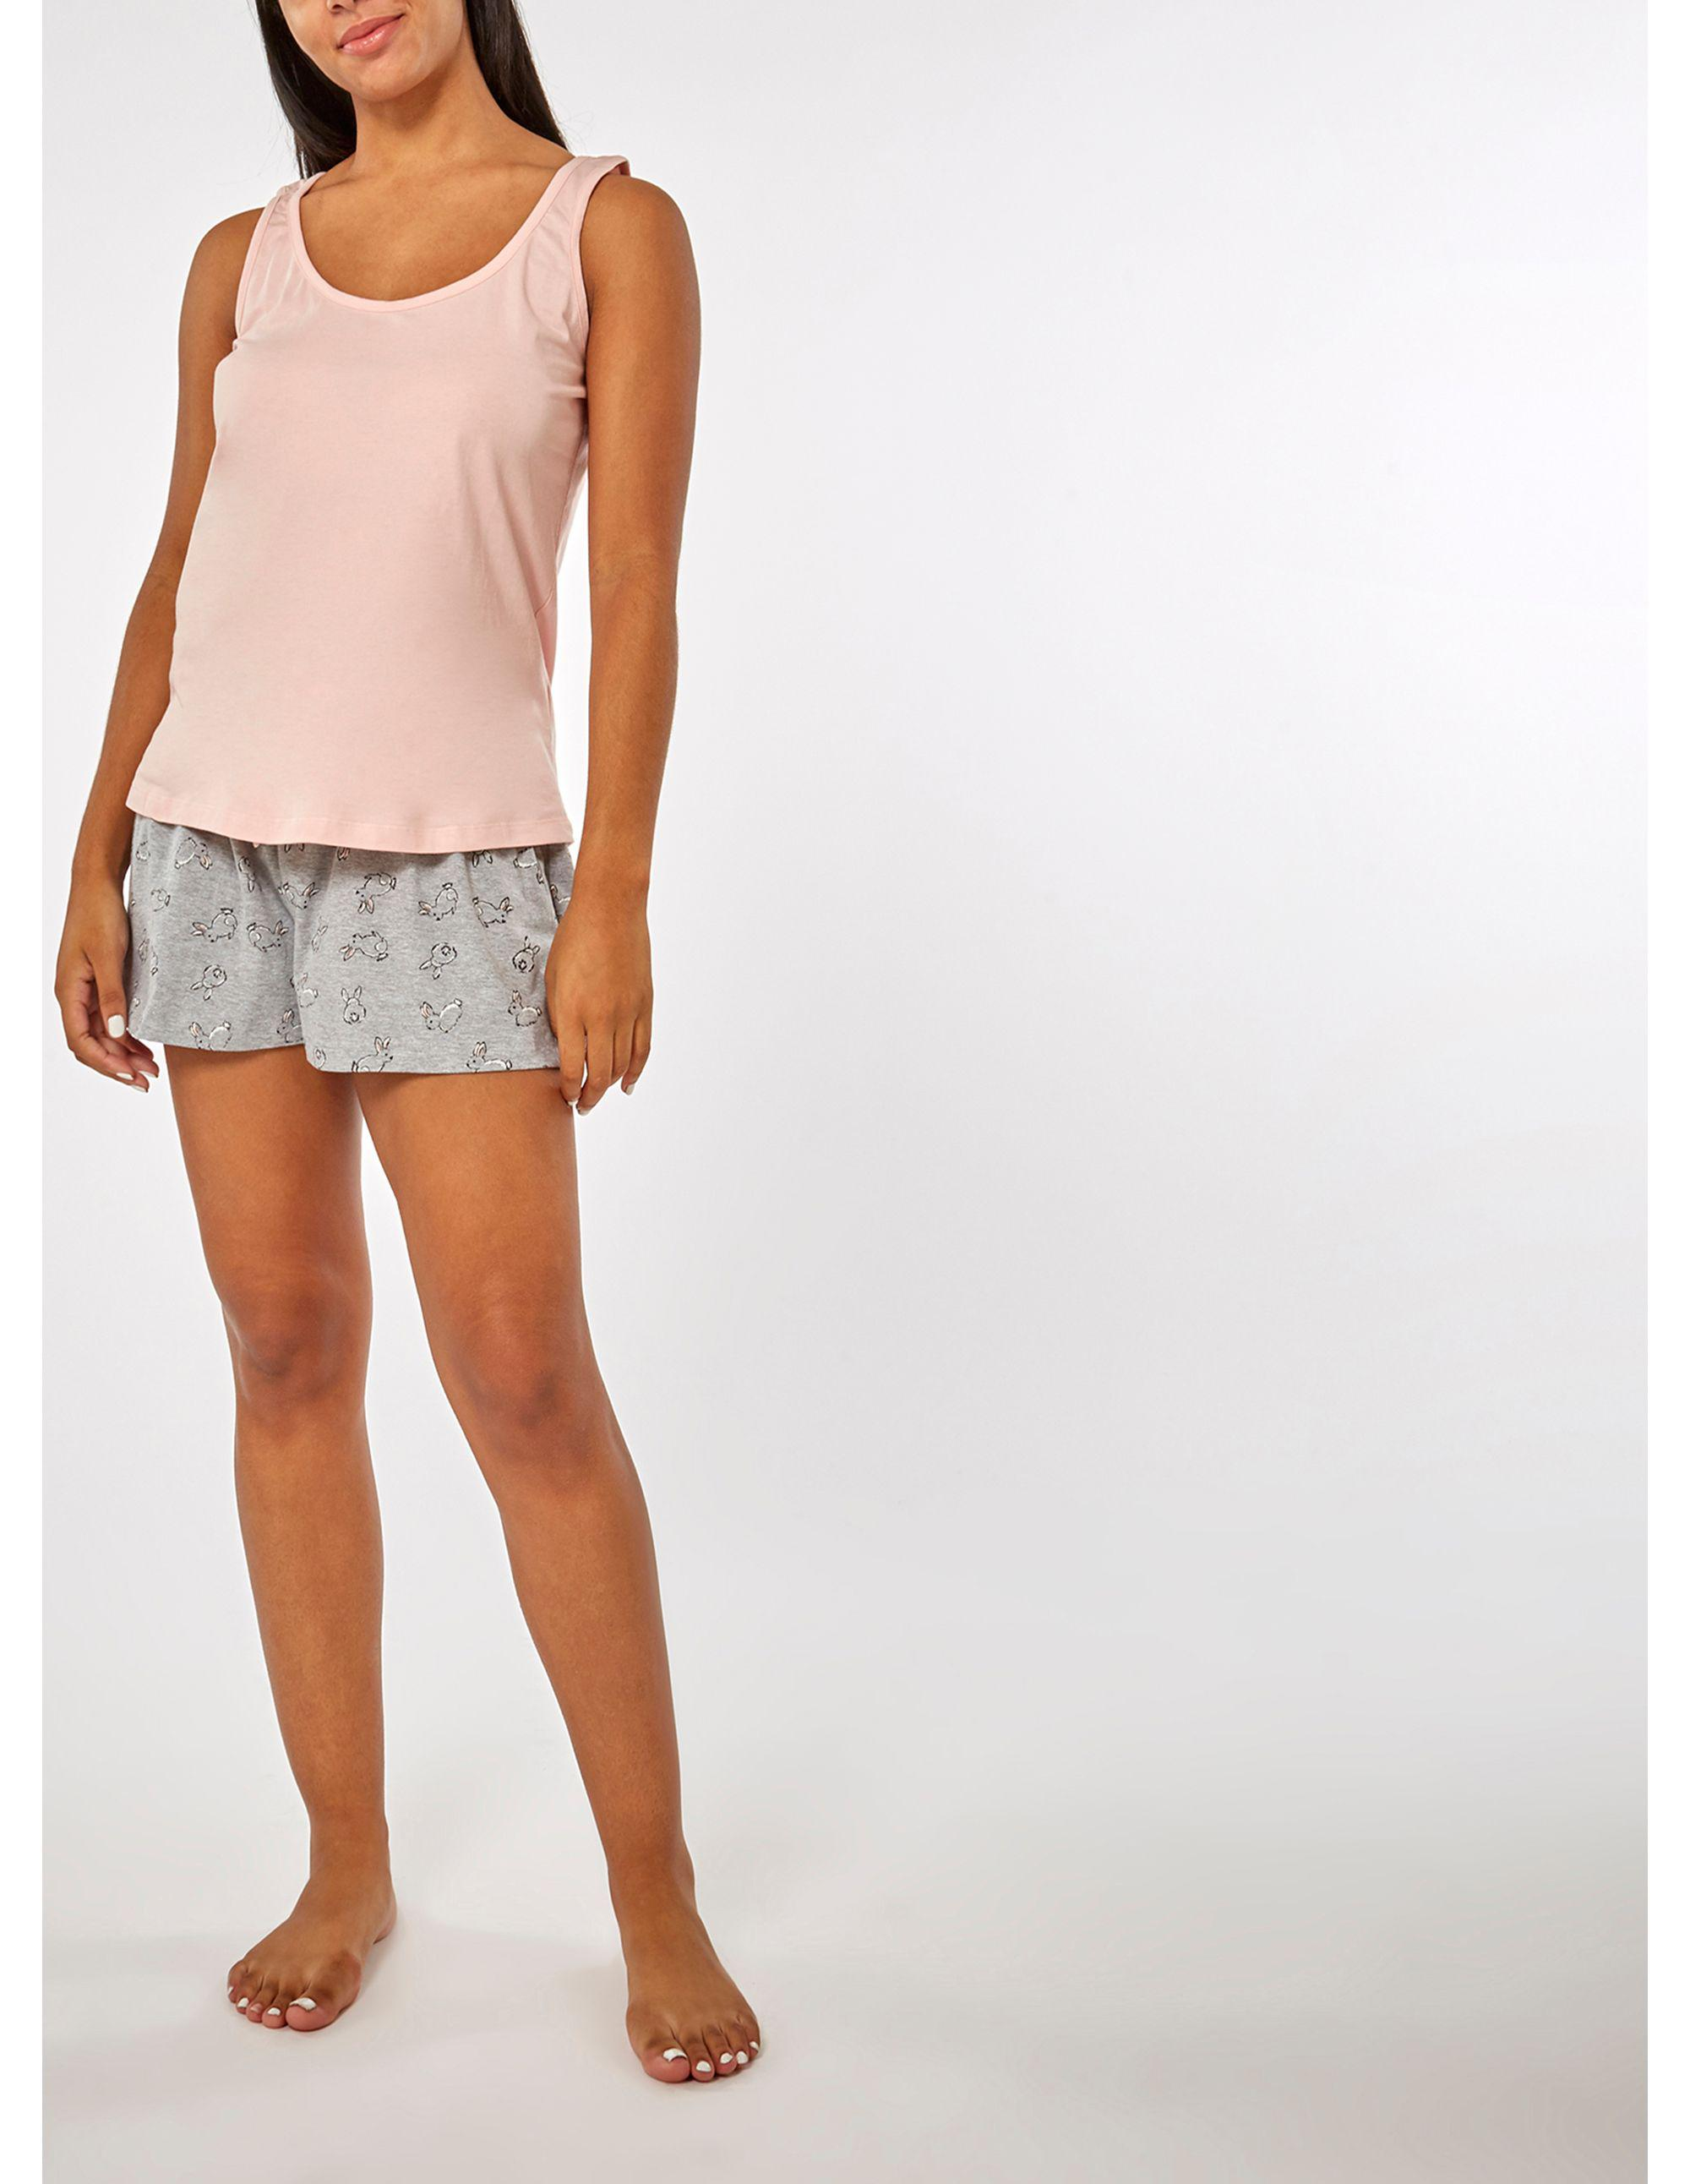 fdbde9c55d Dorothy Perkins Grey And Pink Bunny Short Pyjama Set In A Bag - Lyst